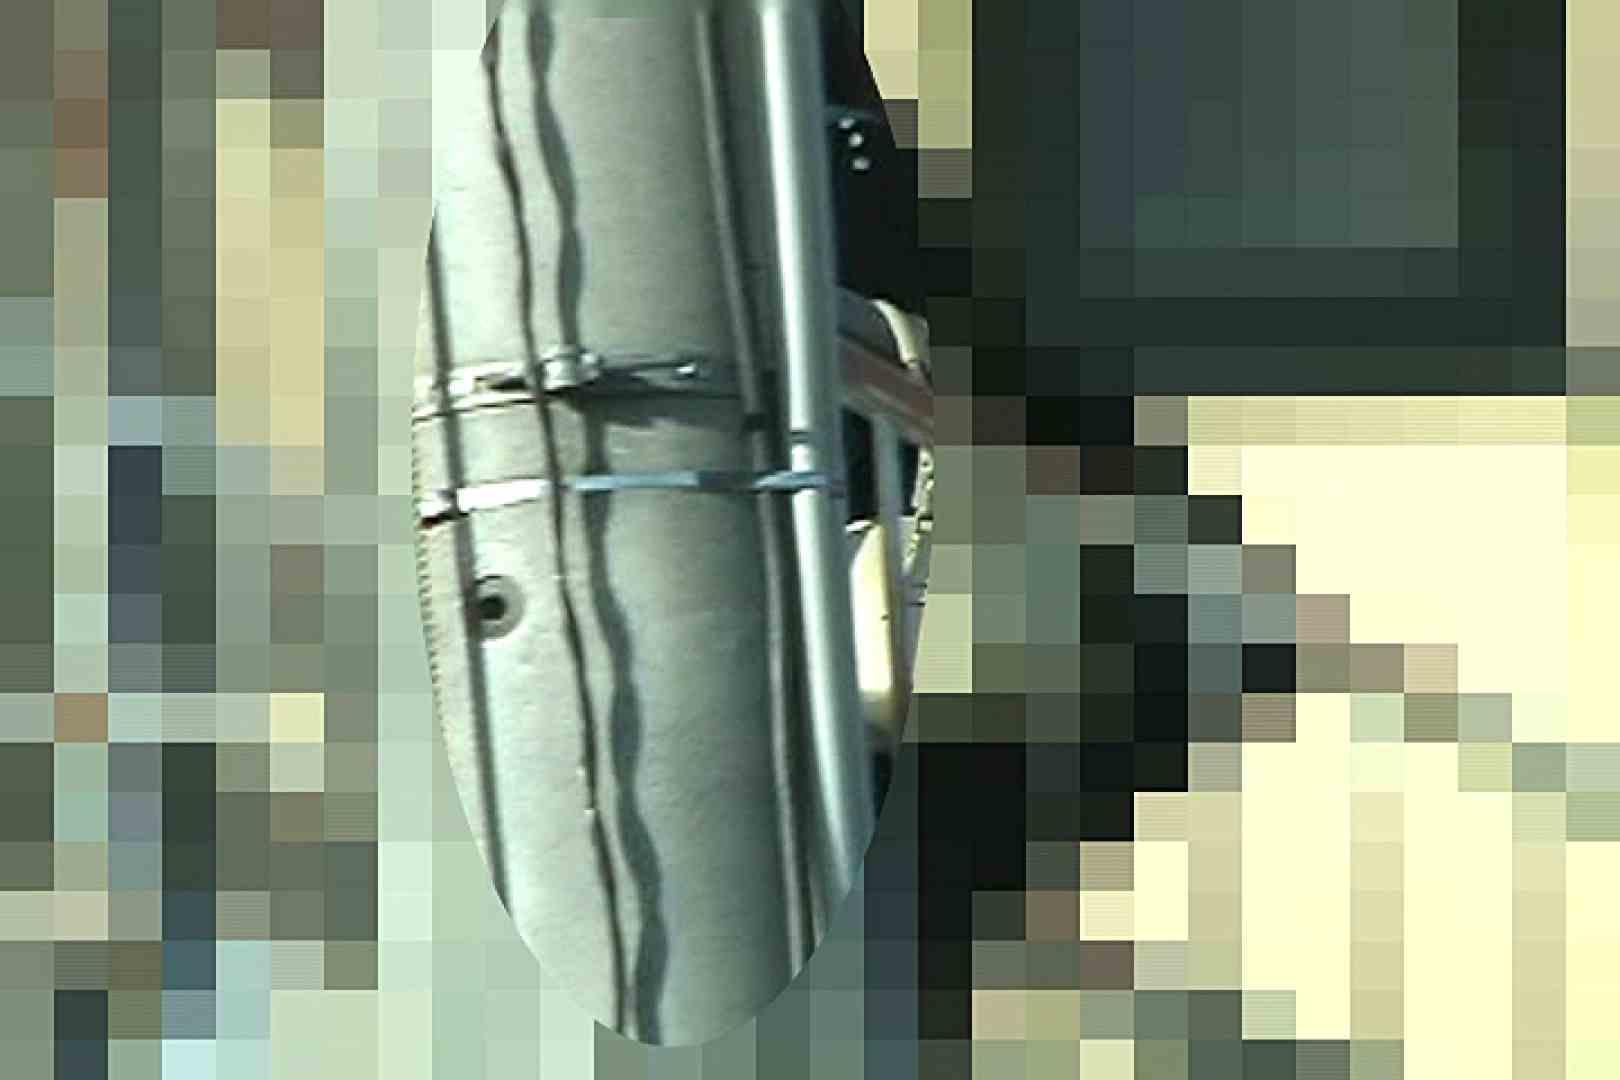 Aquaな露天風呂Vol.25 露天風呂編 | 盗撮シリーズ  91PIX 15